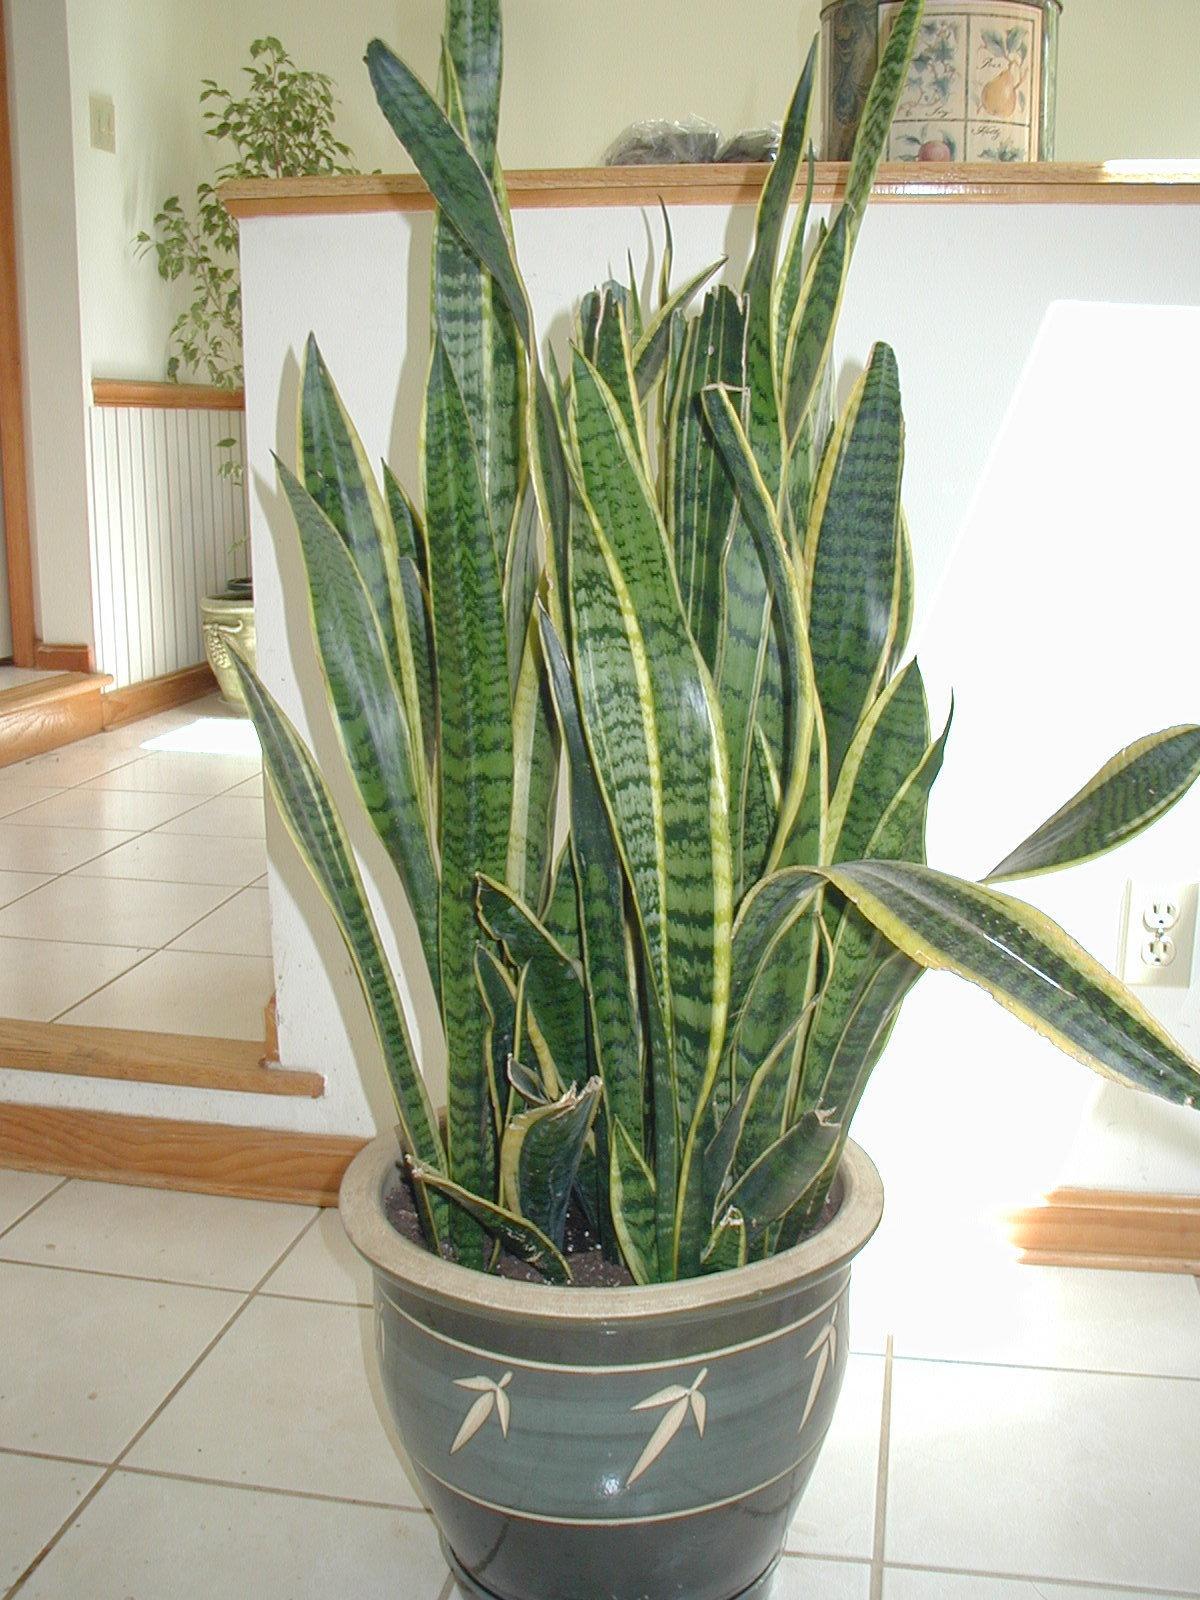 Snake plant (sansevieria)